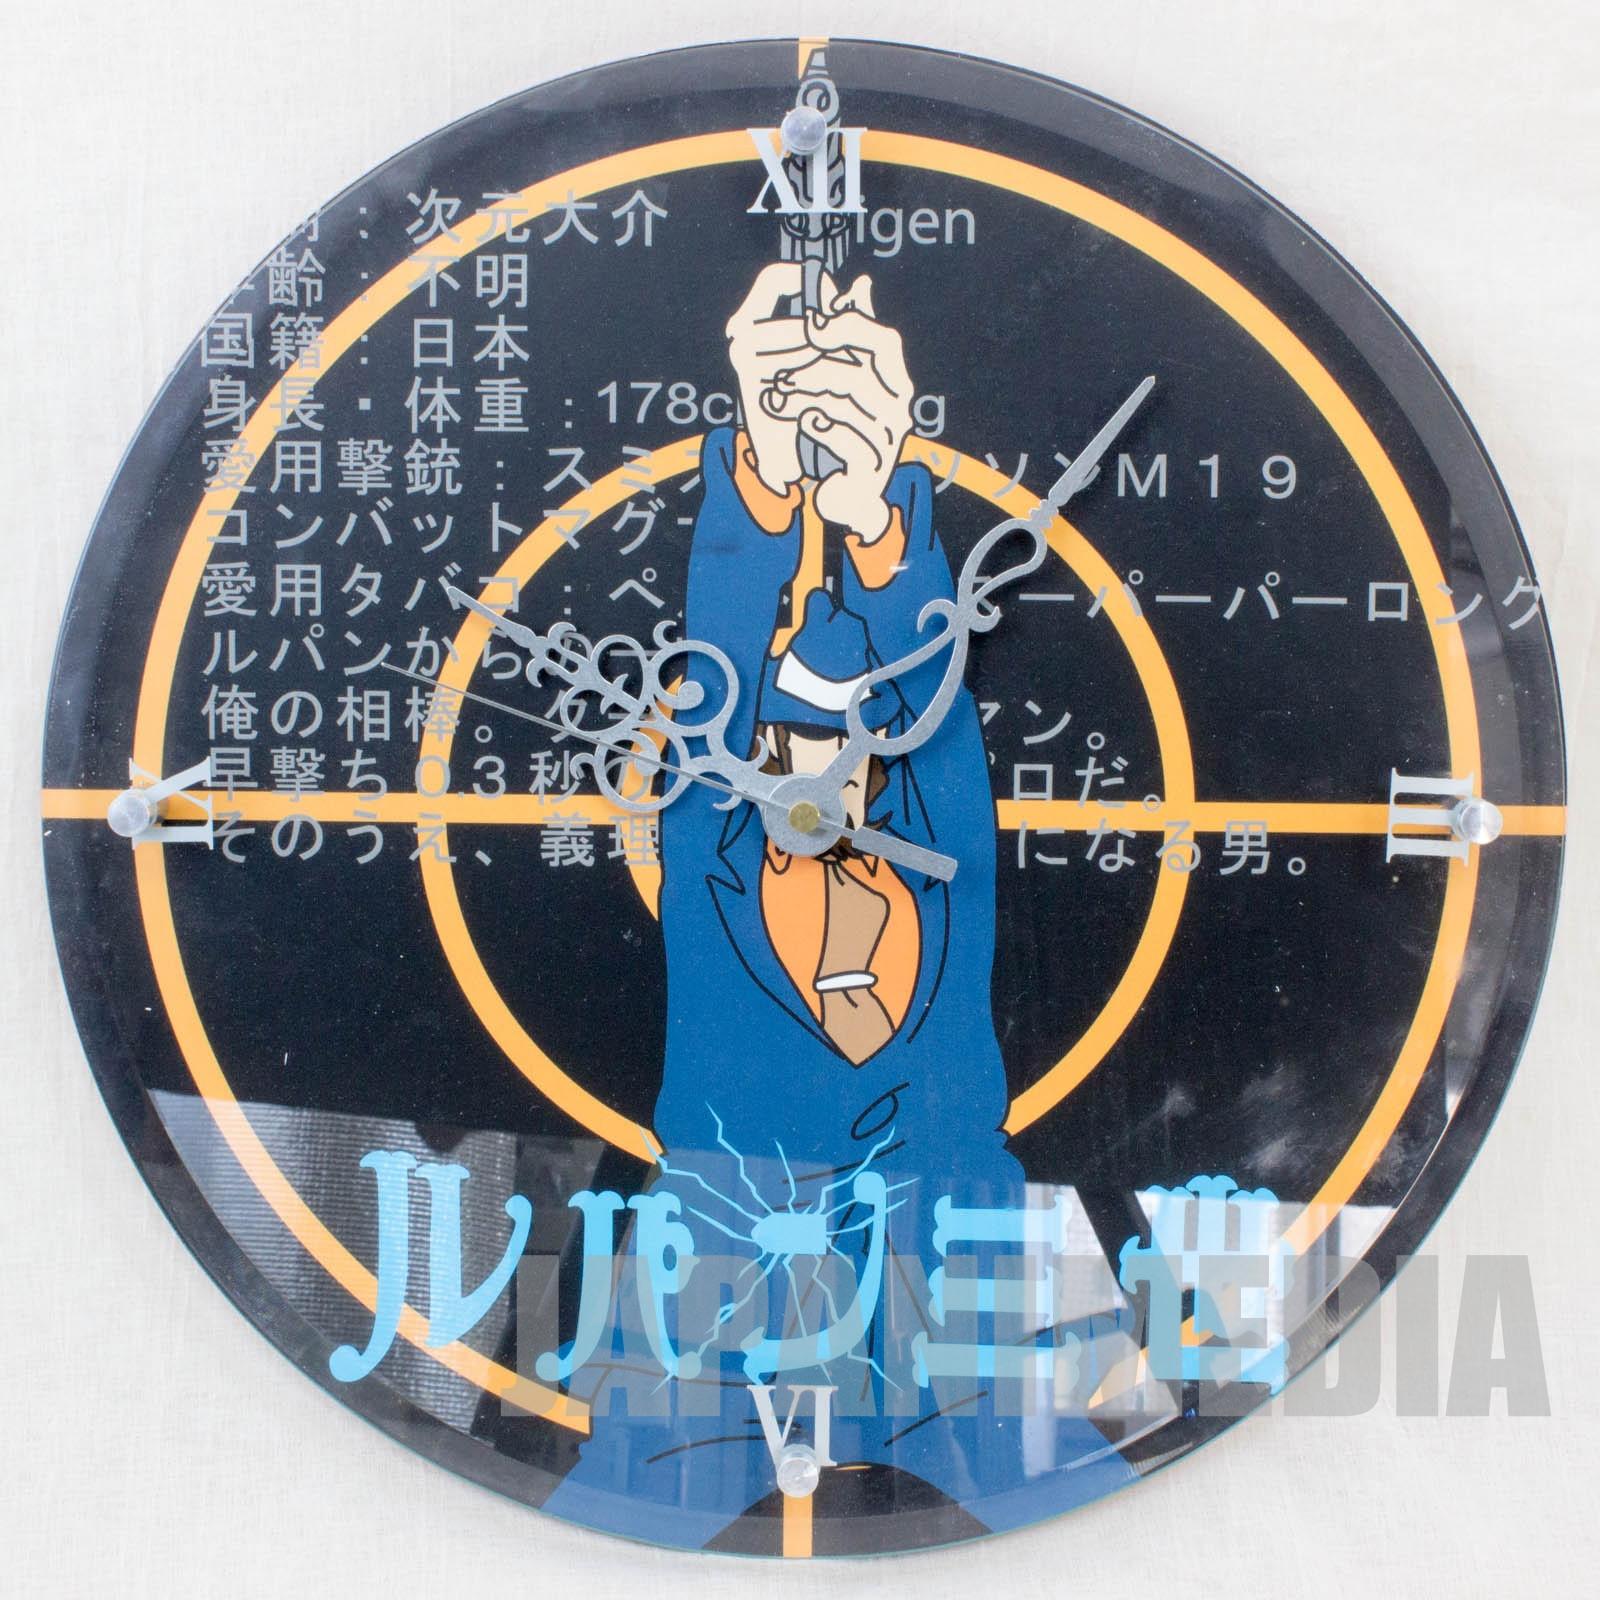 RARE!! Lupin the Third (3rd) Daisuke Jigen Wall clock JAPAN ANIME